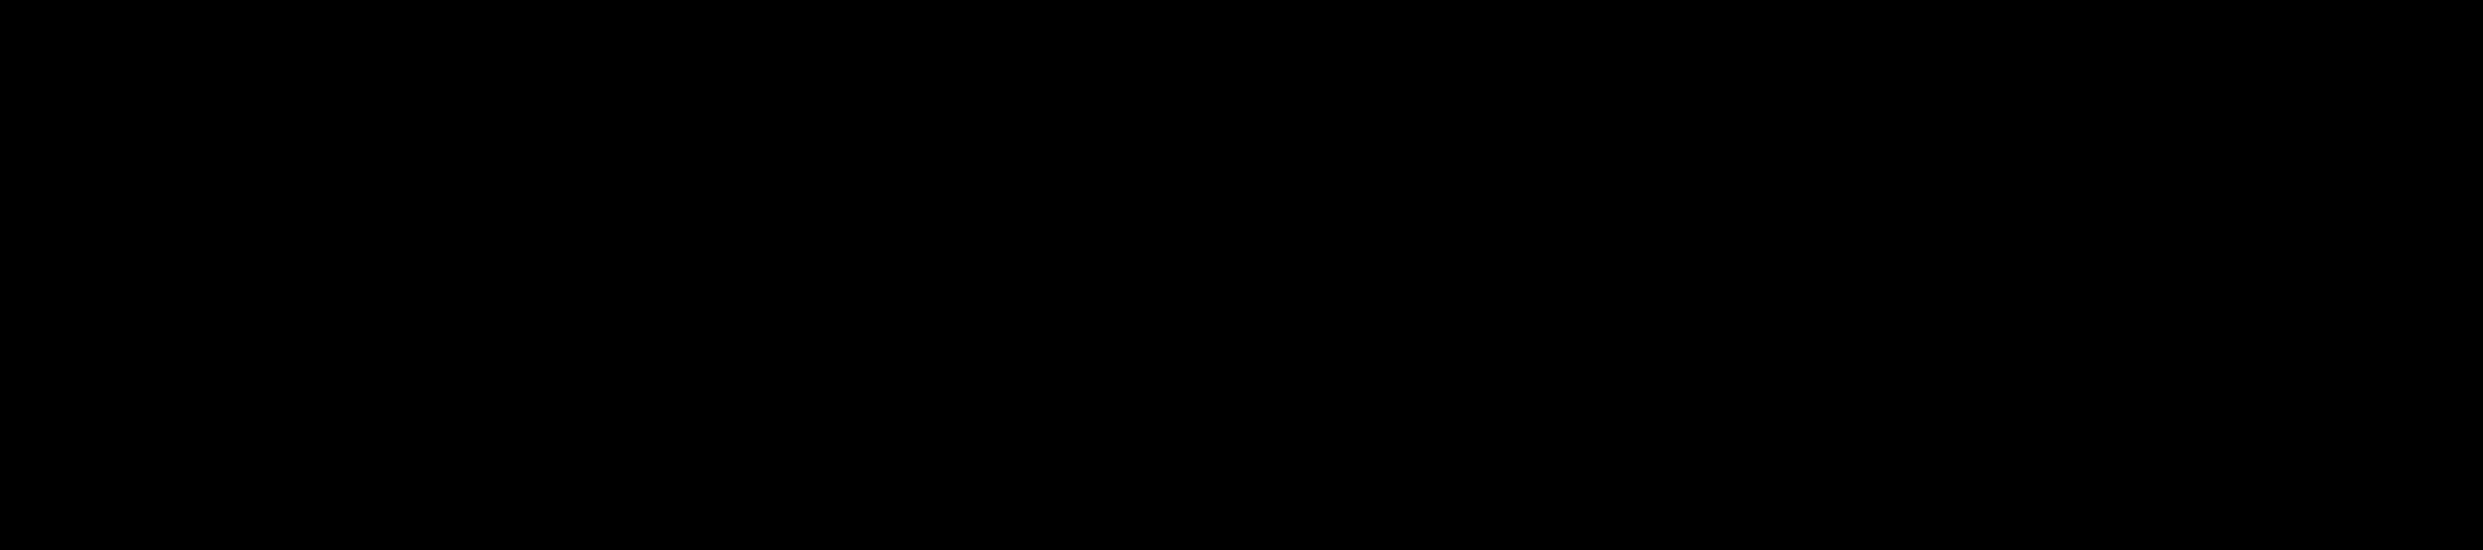 negro_f